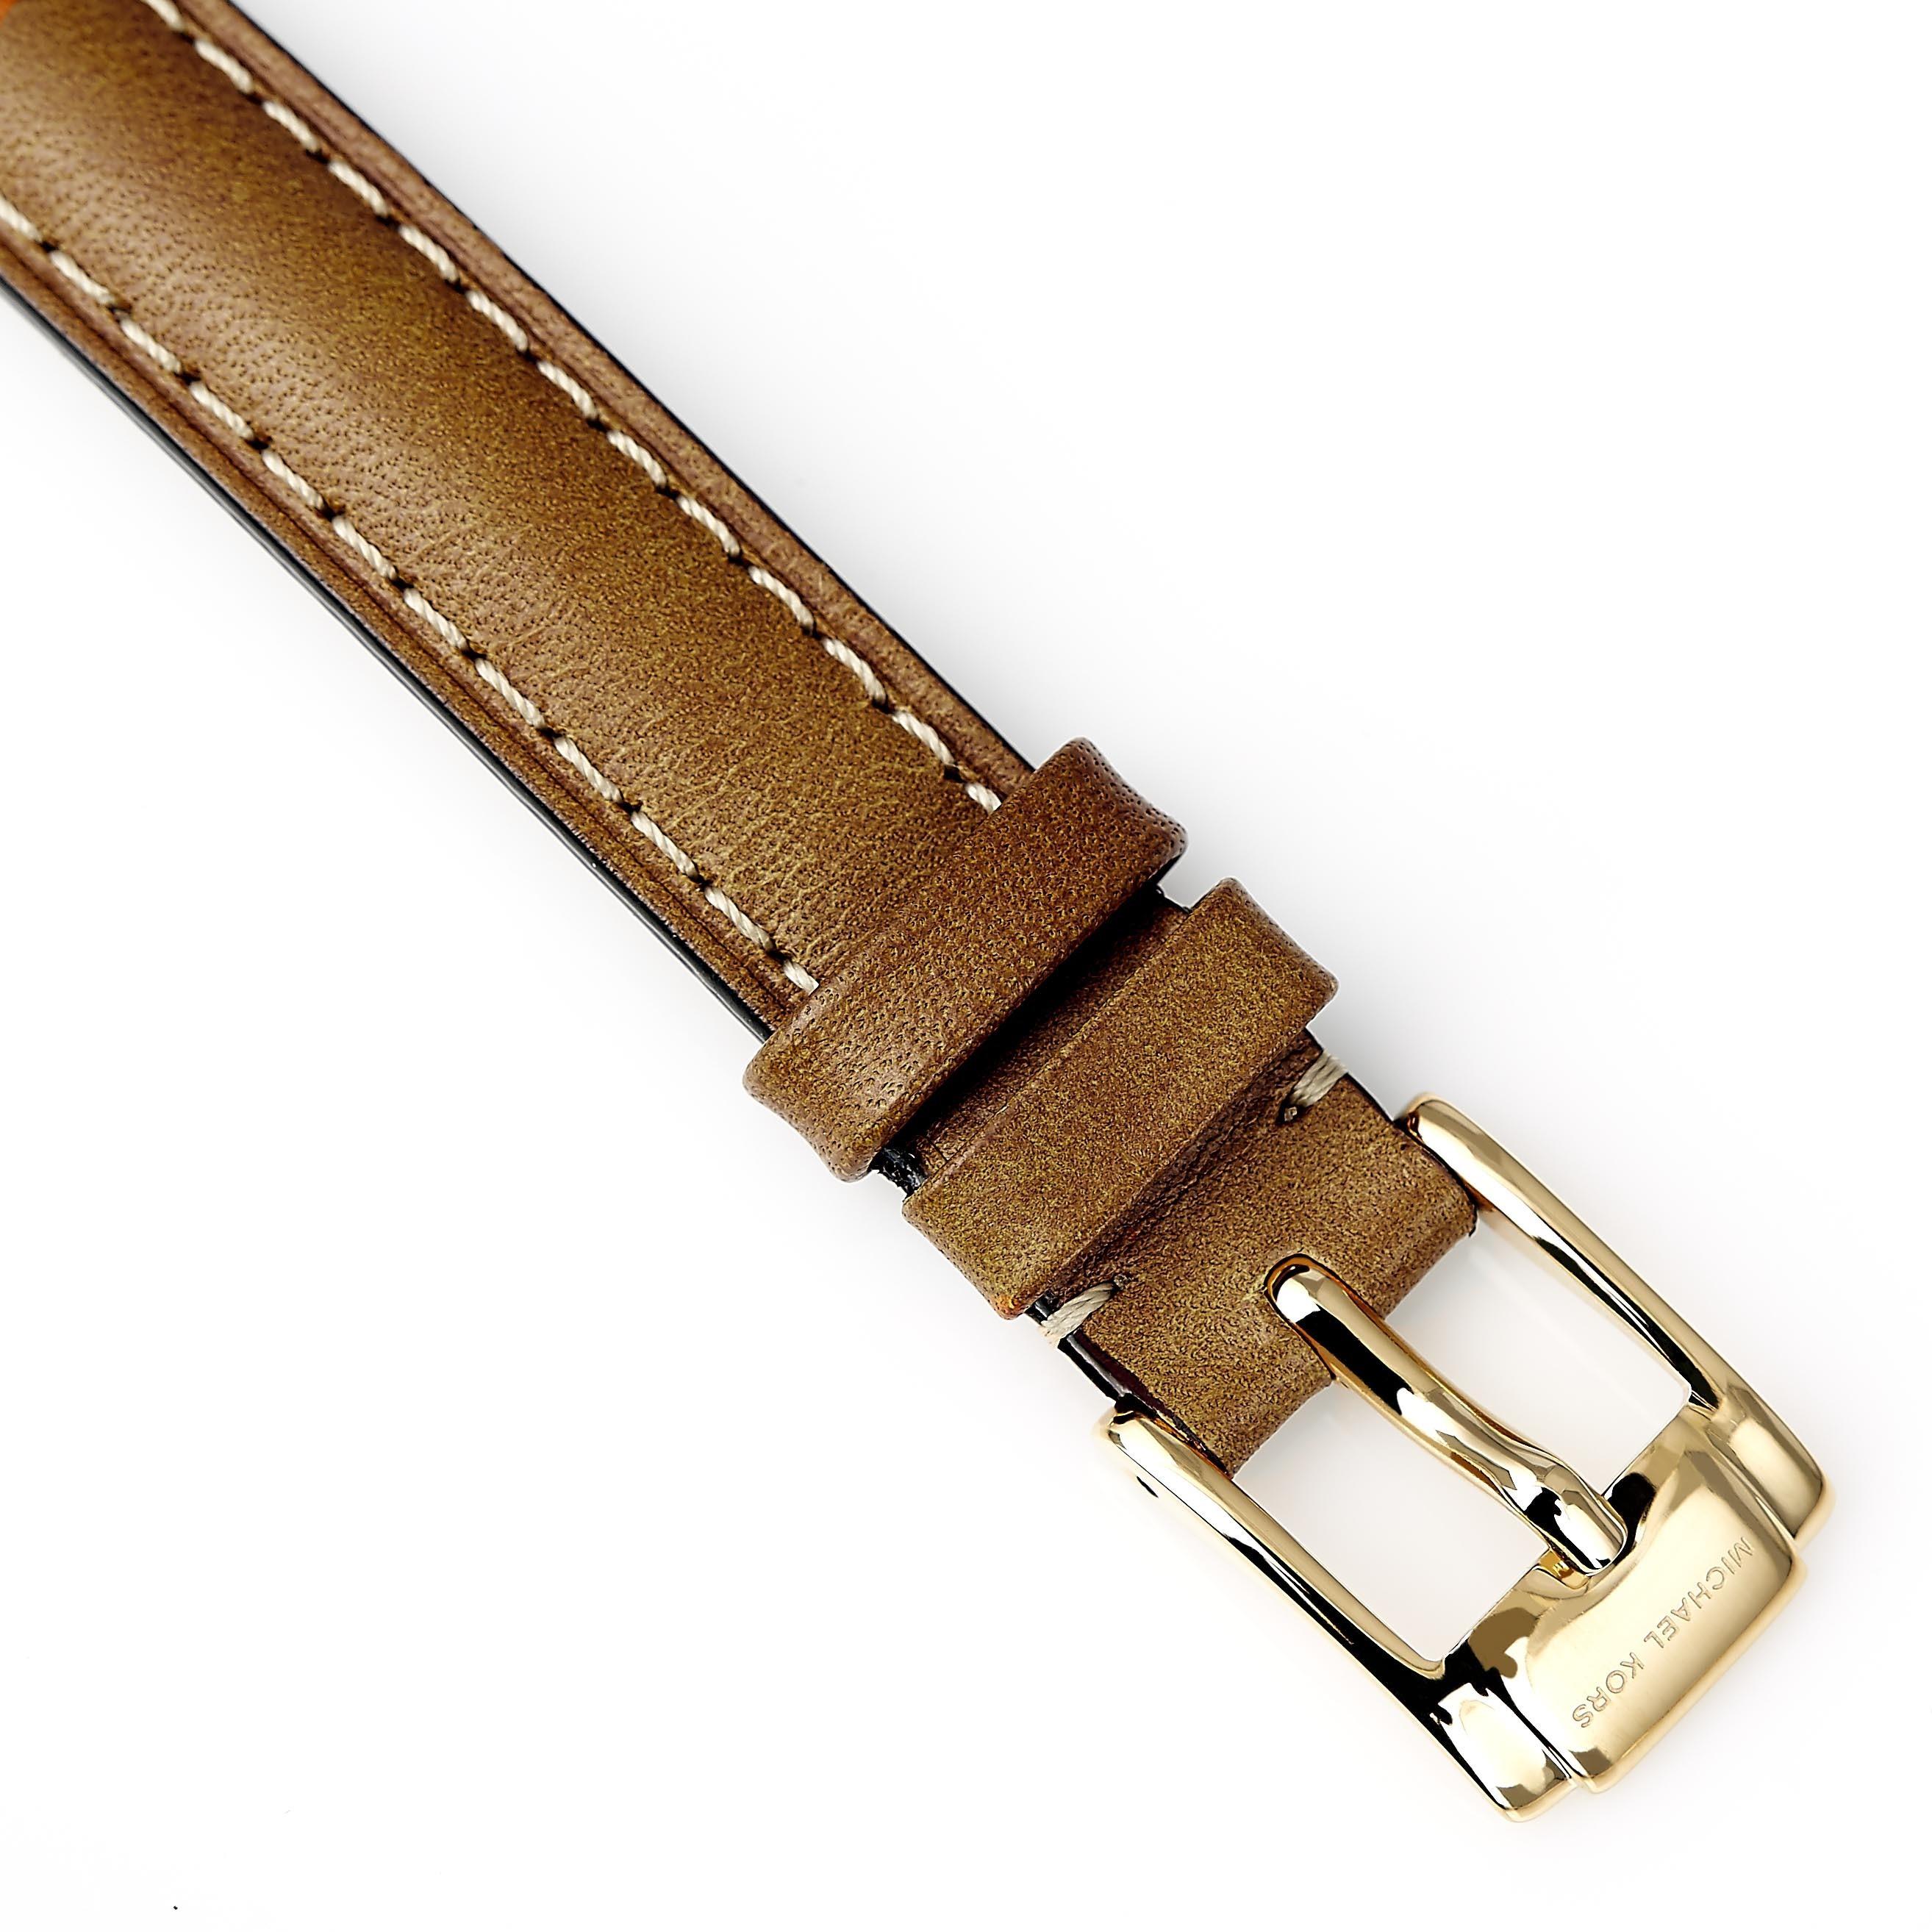 945ffad293637 Shop Michael Kors Women s Slim Runway Logo Dial Watch - Free Shipping Today  - Overstock - 9190541